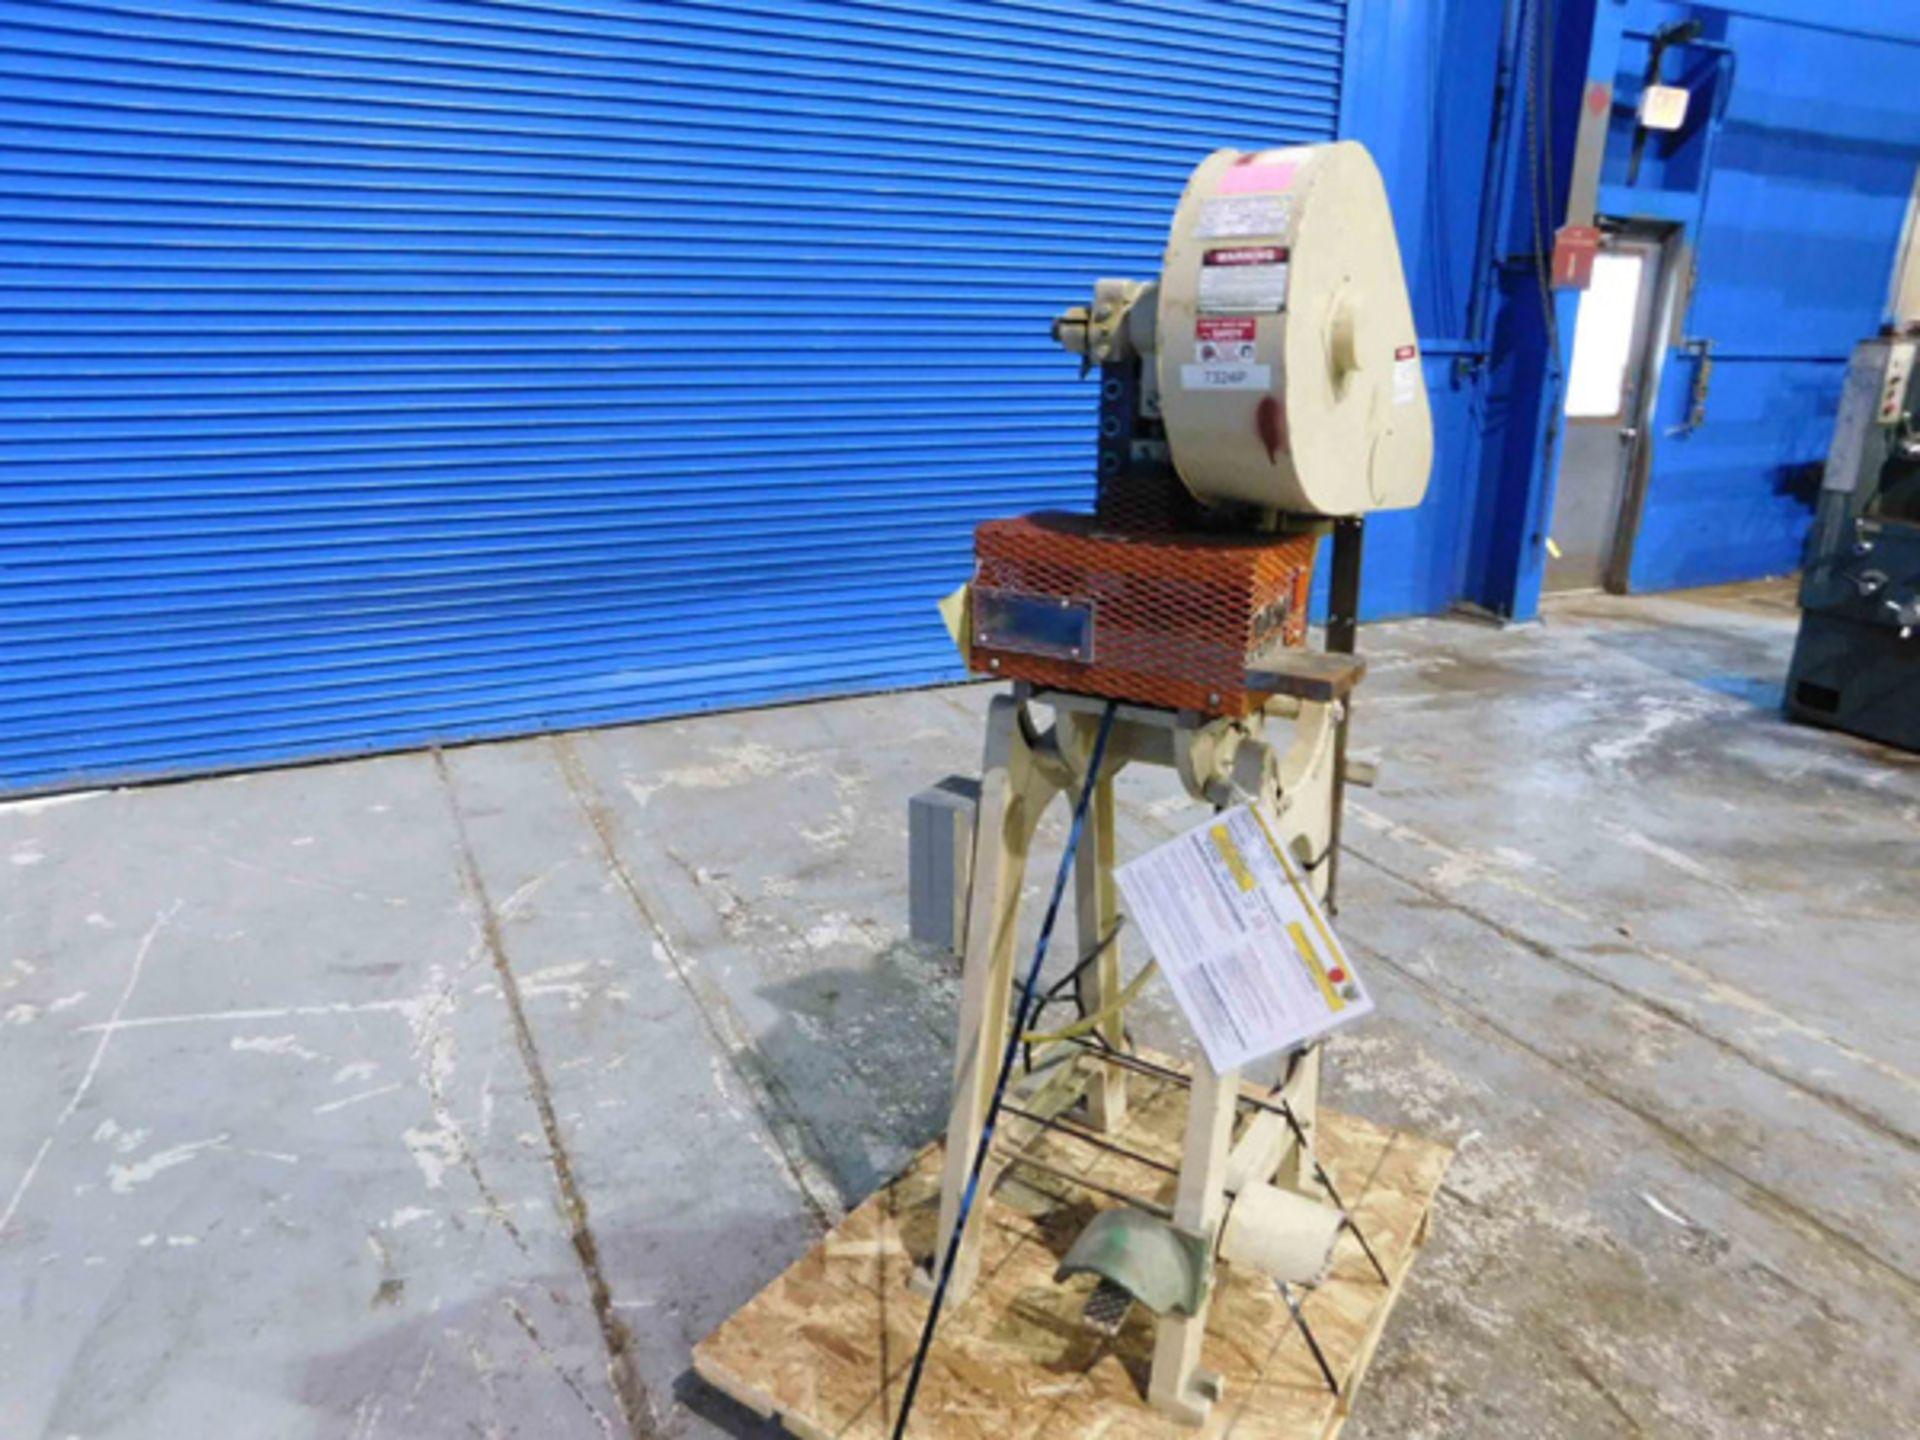 Lot 29 - Alva Allen OBI Punch Press | 5-Ton, Mdl: BT-5, S/N: GJD63853 - 7324P